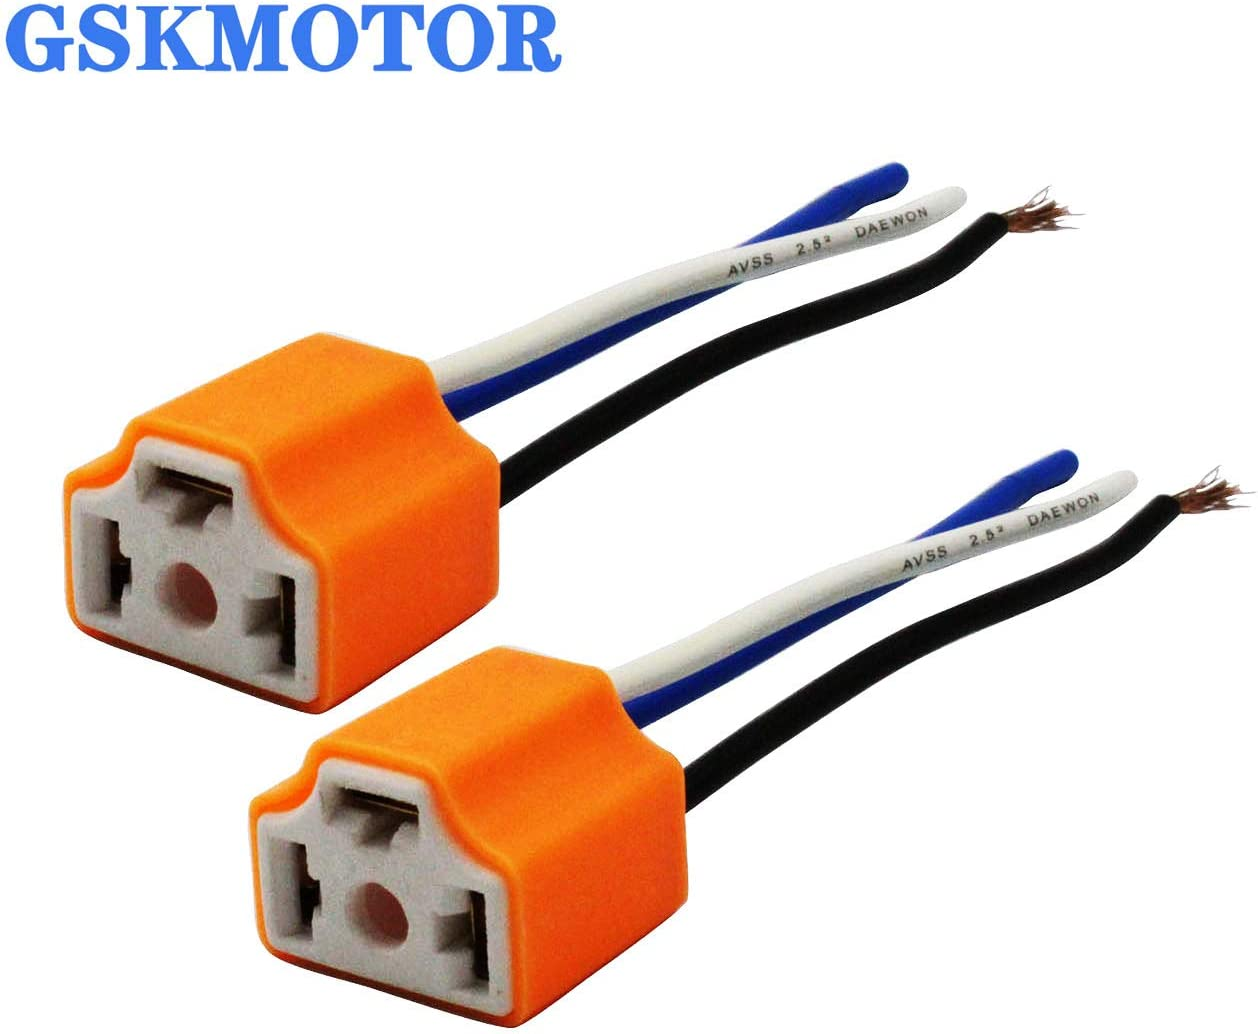 GSKMOTOR H4//9003//HB2 Ceramic Plug Adapter Socket Super Durable 2 PCS Female Pigtail Headlight Connector H4 Ceramic Sockets Headlight Adapter